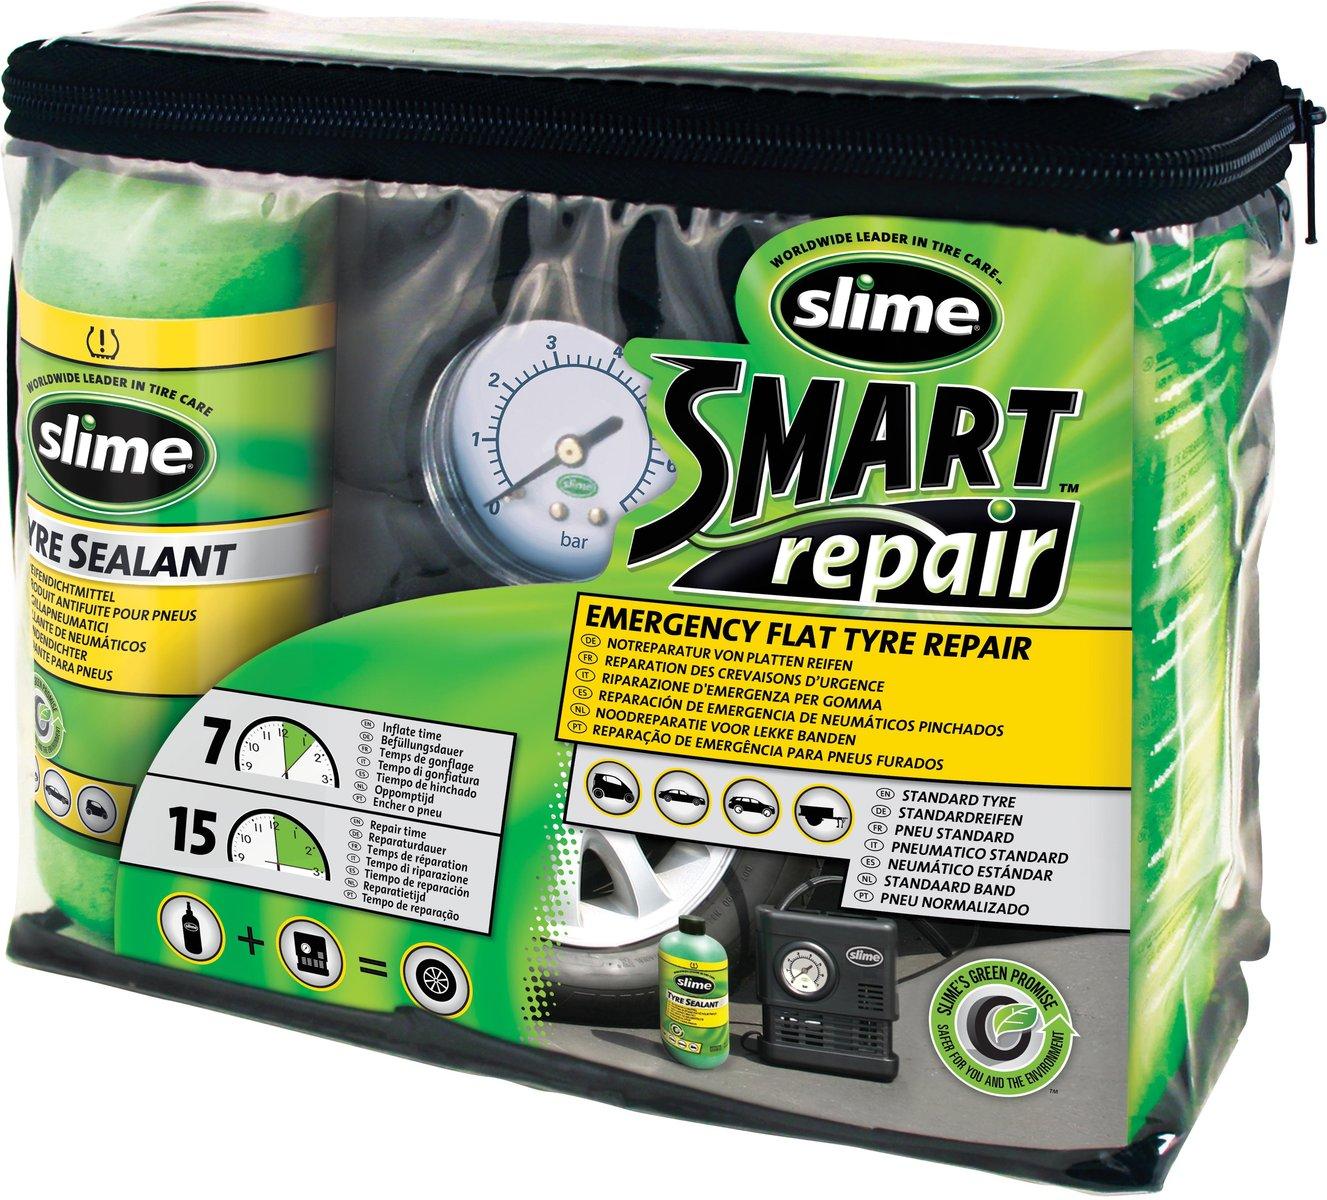 Slime Reifen Pannenset mit Kompressor+Dichtmittel Tire Repair Kit Smart Repair